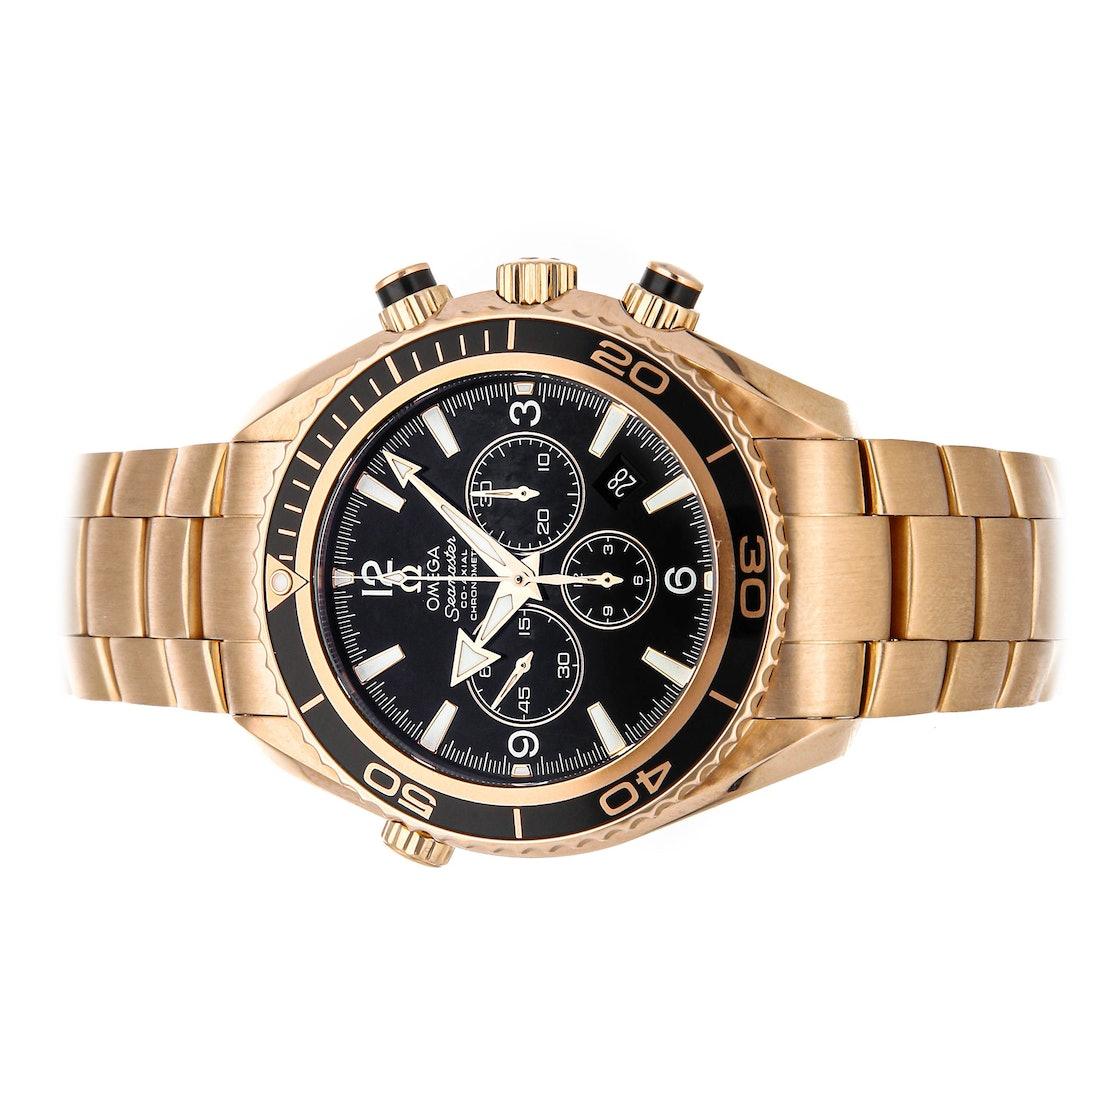 Omega Seamaster Planet Ocean 600m Chronograph 222.60.46.50.01.001